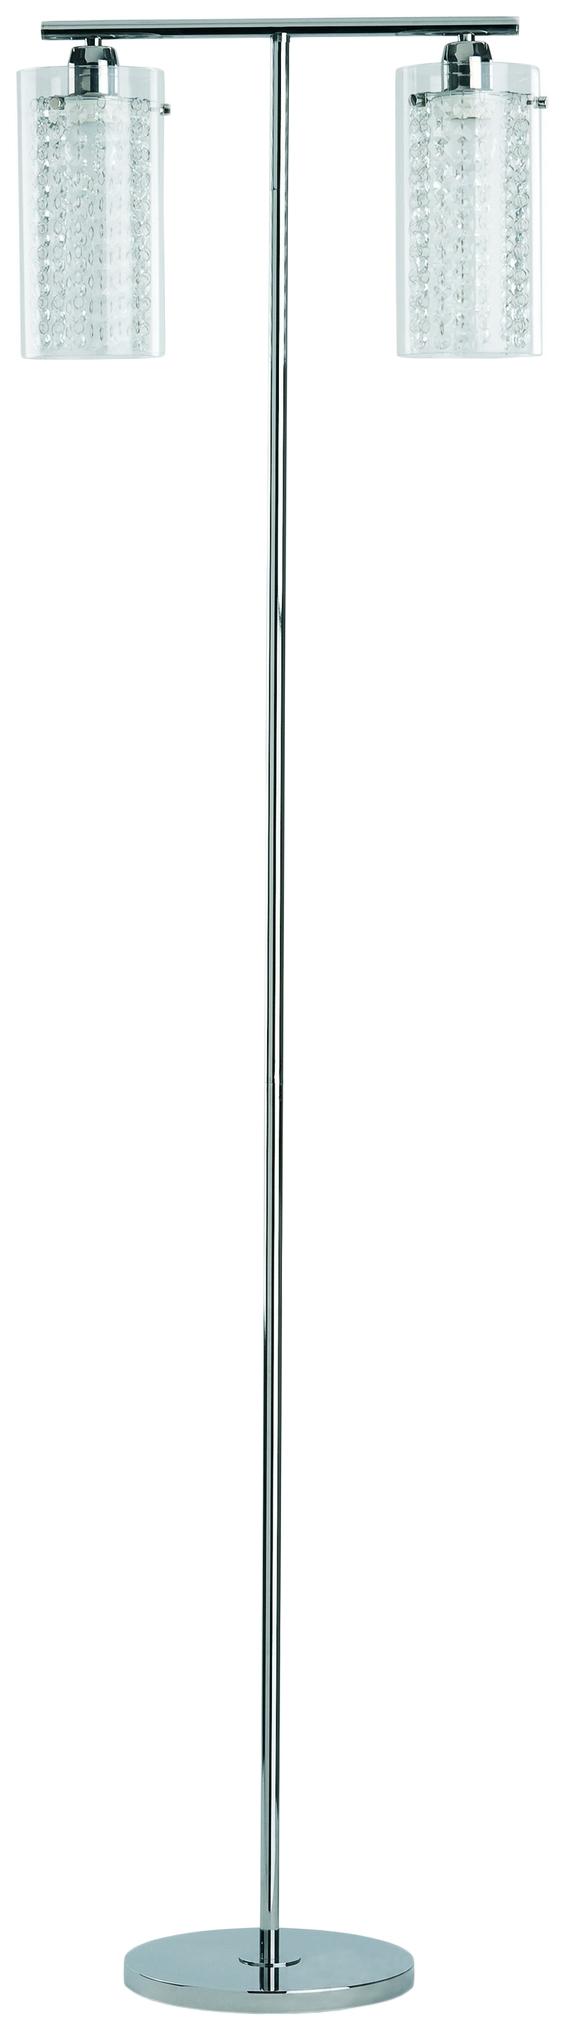 Торшер Alfa 16229 E27